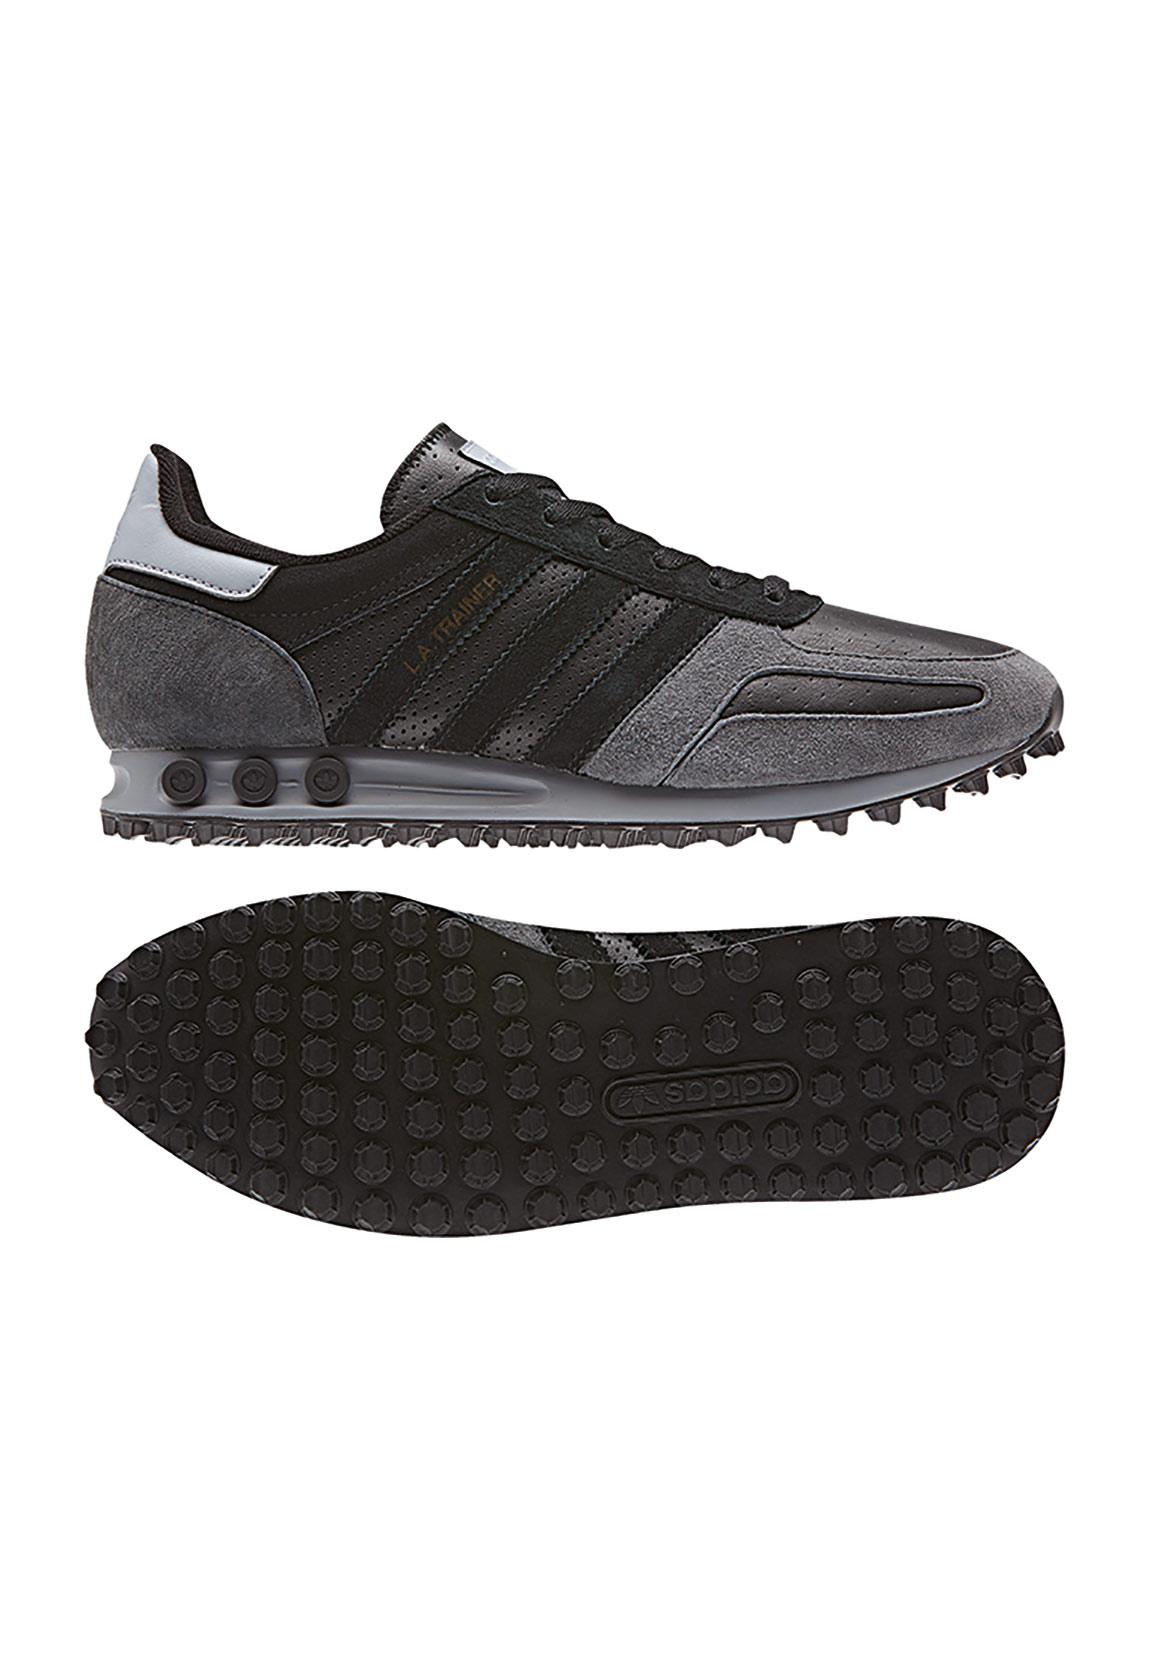 Adidas Originals Sneaker LA TRAINER CQ2273 Schwarz bei Fashioncode.de